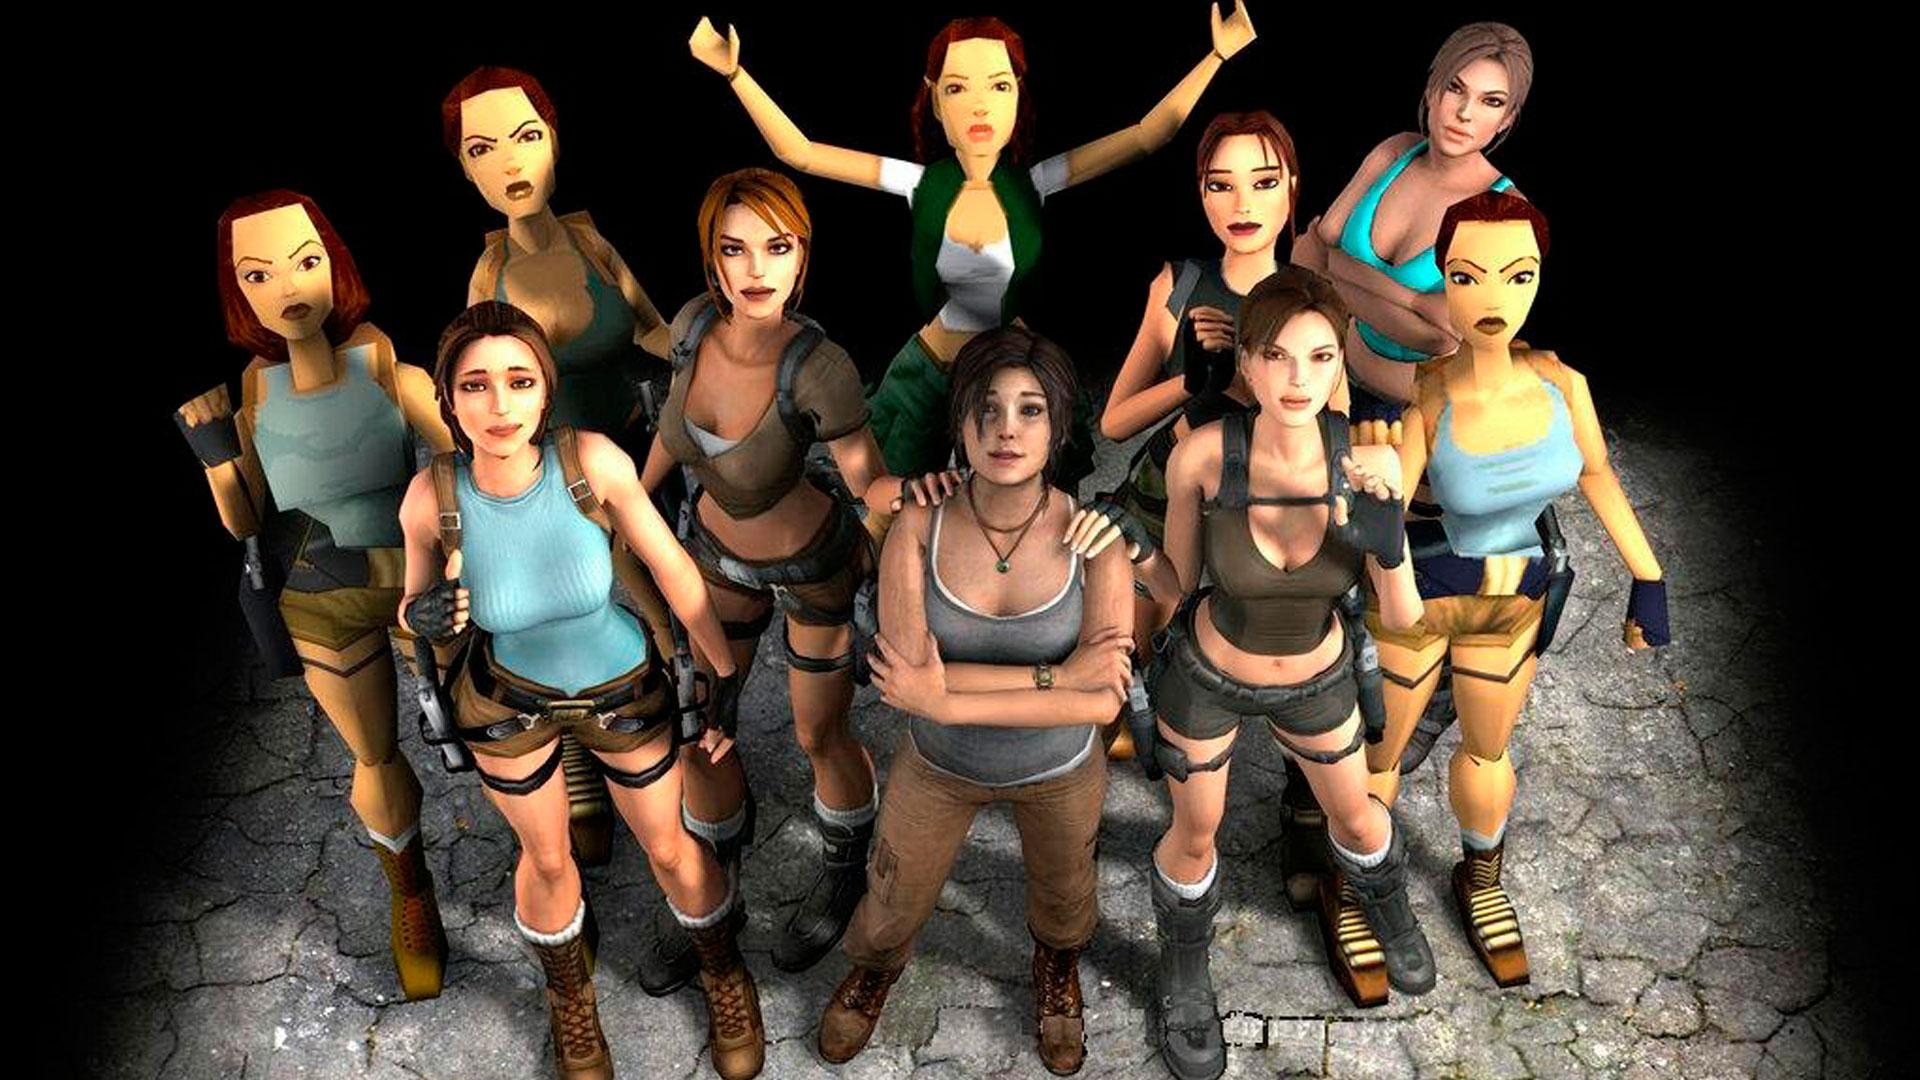 Слух: Tomb Raider: The Ultimate Experience выйдет на Switch